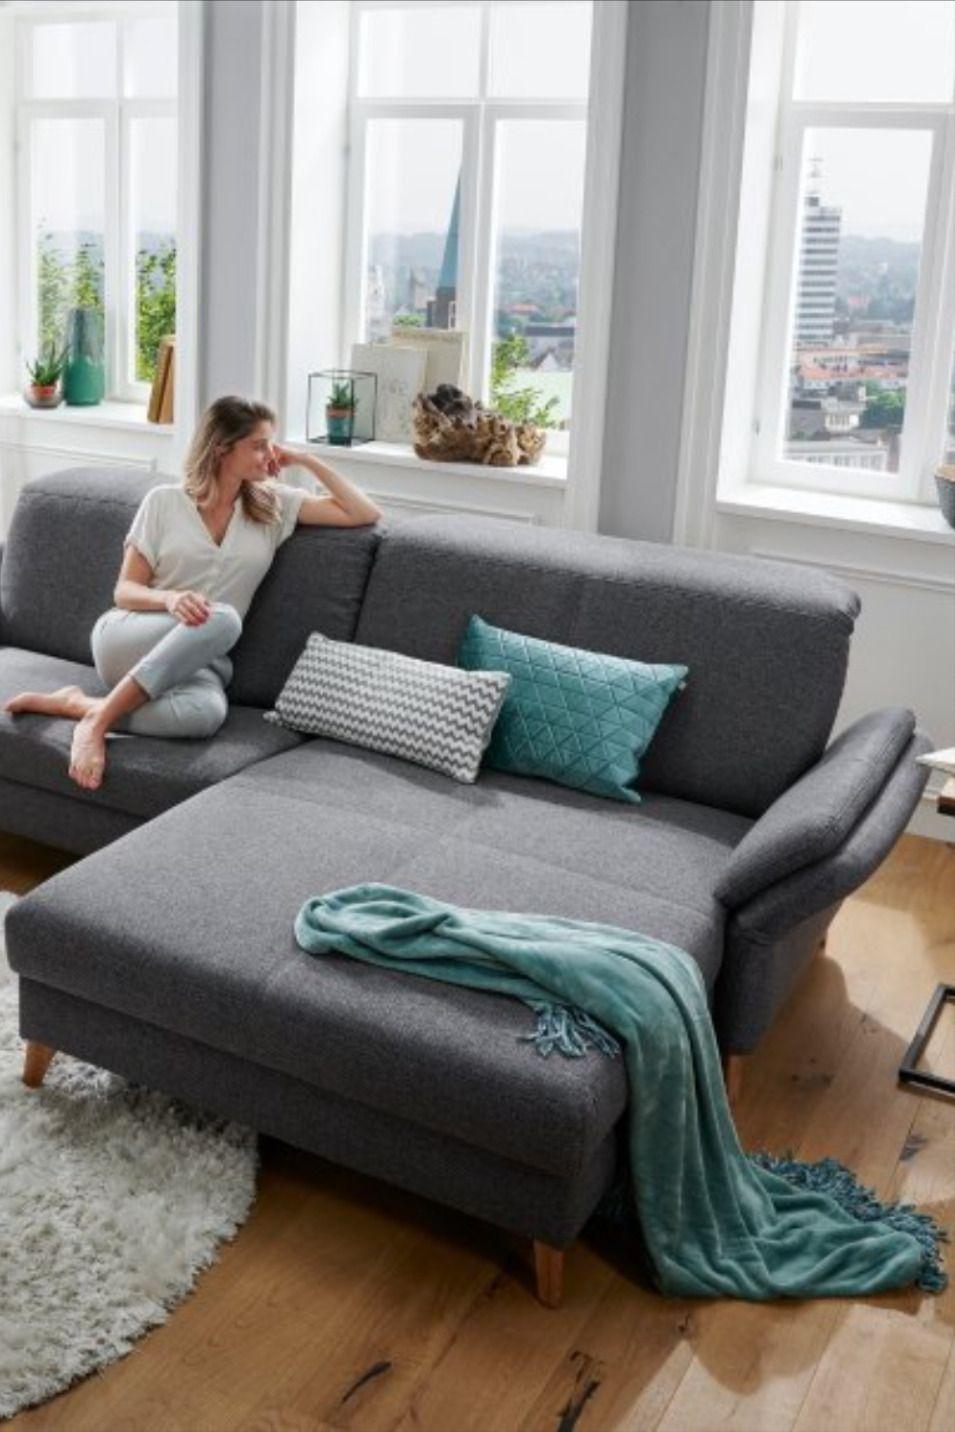 Full Size of Natura Sofa Couch Denver Home Livingston Newport Kansas Pasadena Love Kaufen Brooklyn Gebraucht Polster Ohne Lehne Kunstleder Lila Günstig Hocker Mit Sofa Natura Sofa